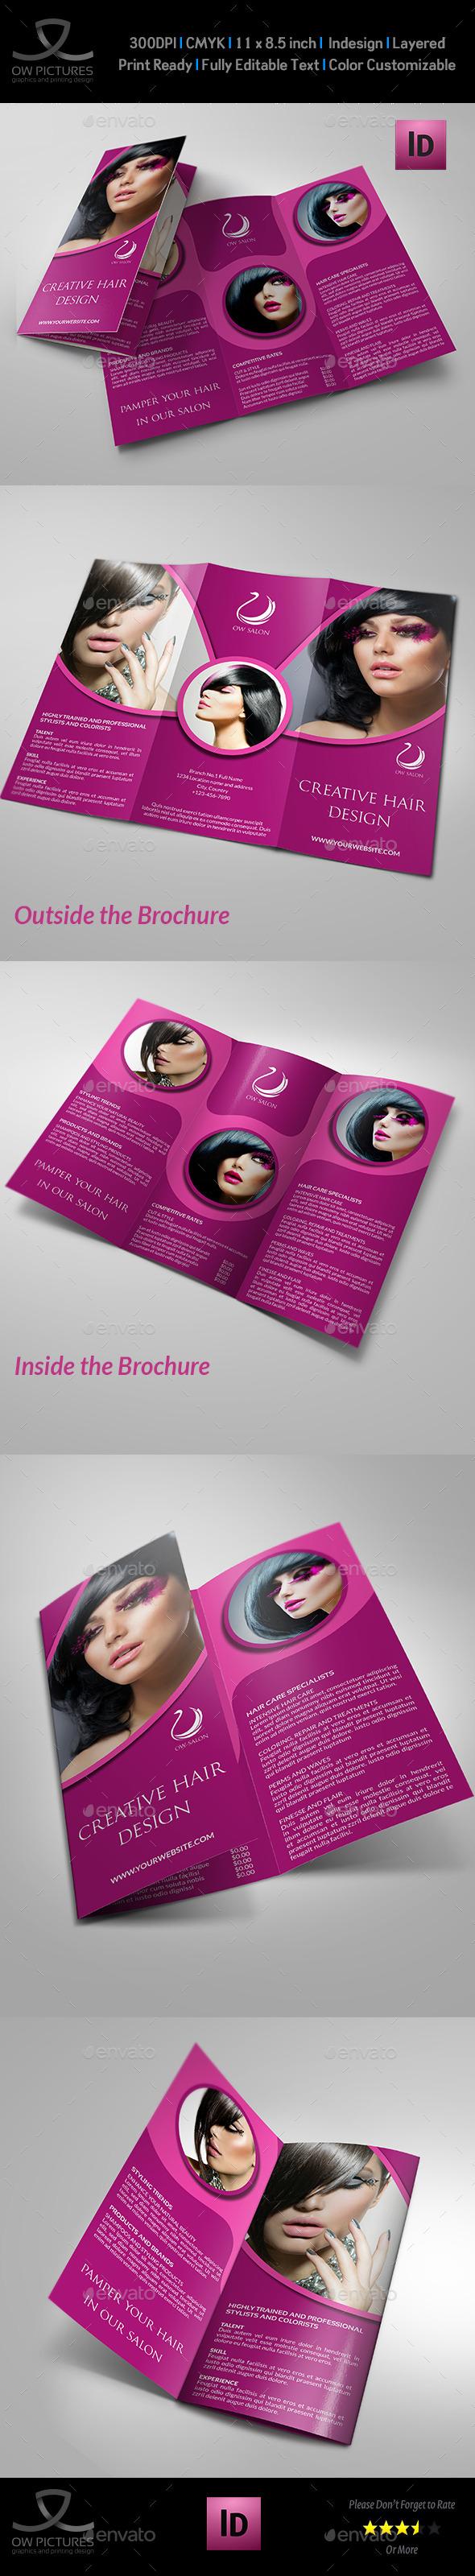 Hair Stylist & Salon Tri-Fold Brochure Vol.2 - Brochures Print Templates